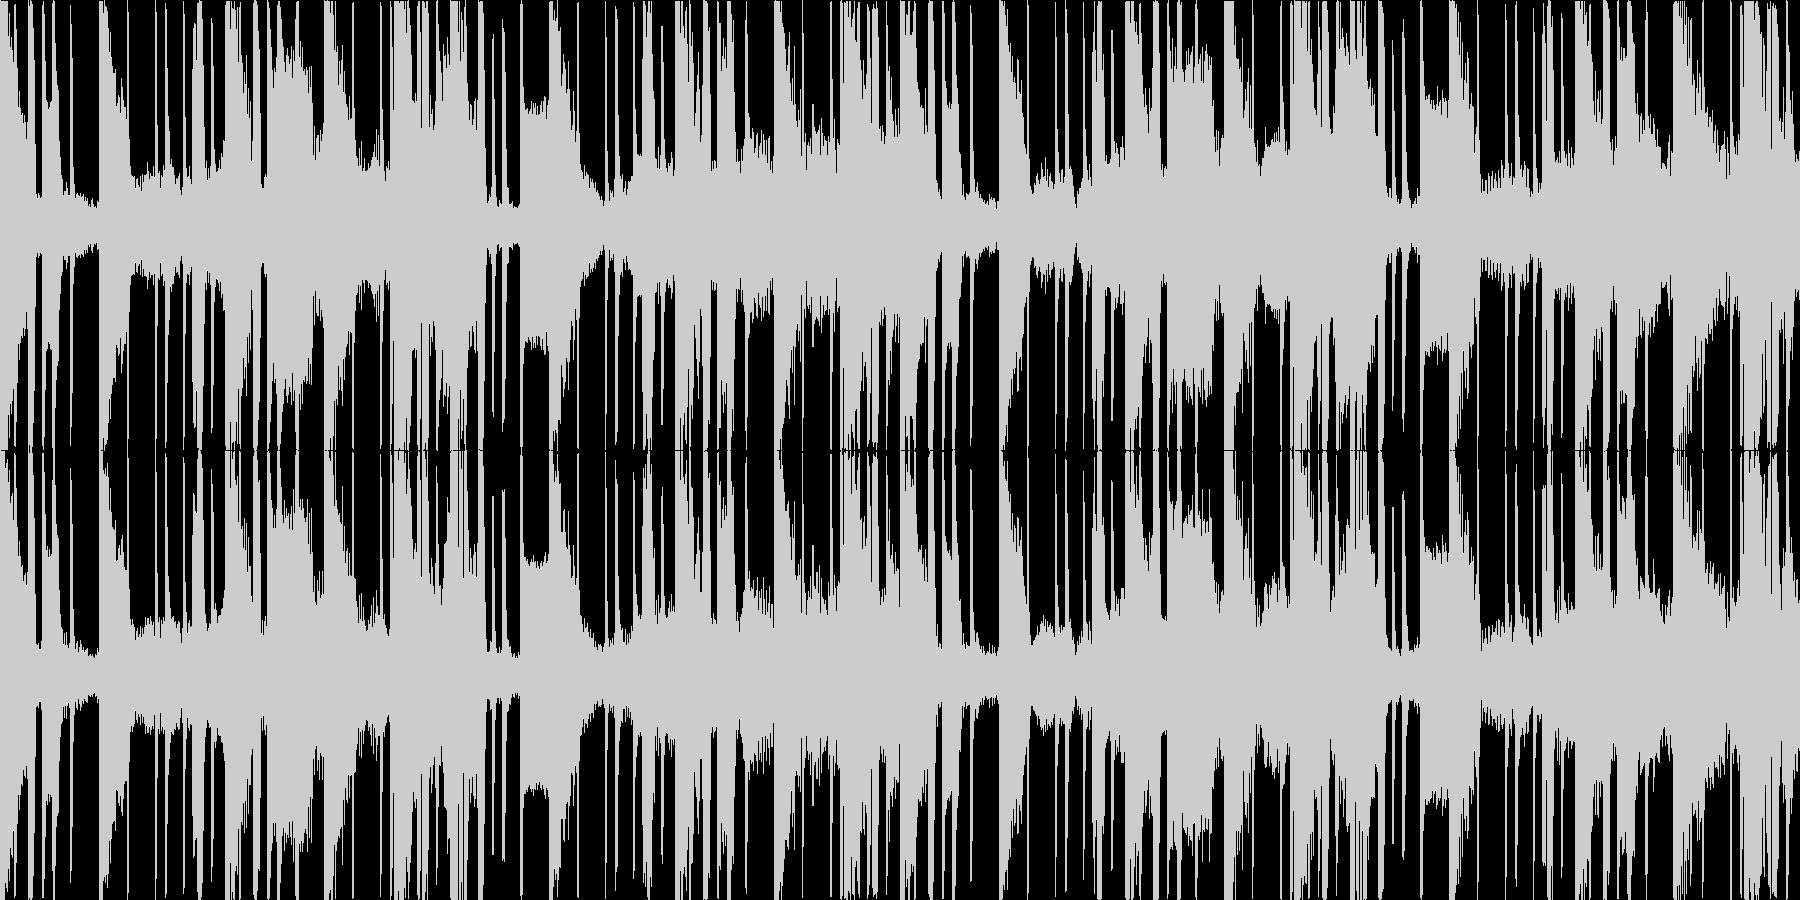 2step風の簡素なループ。低域強め。の未再生の波形